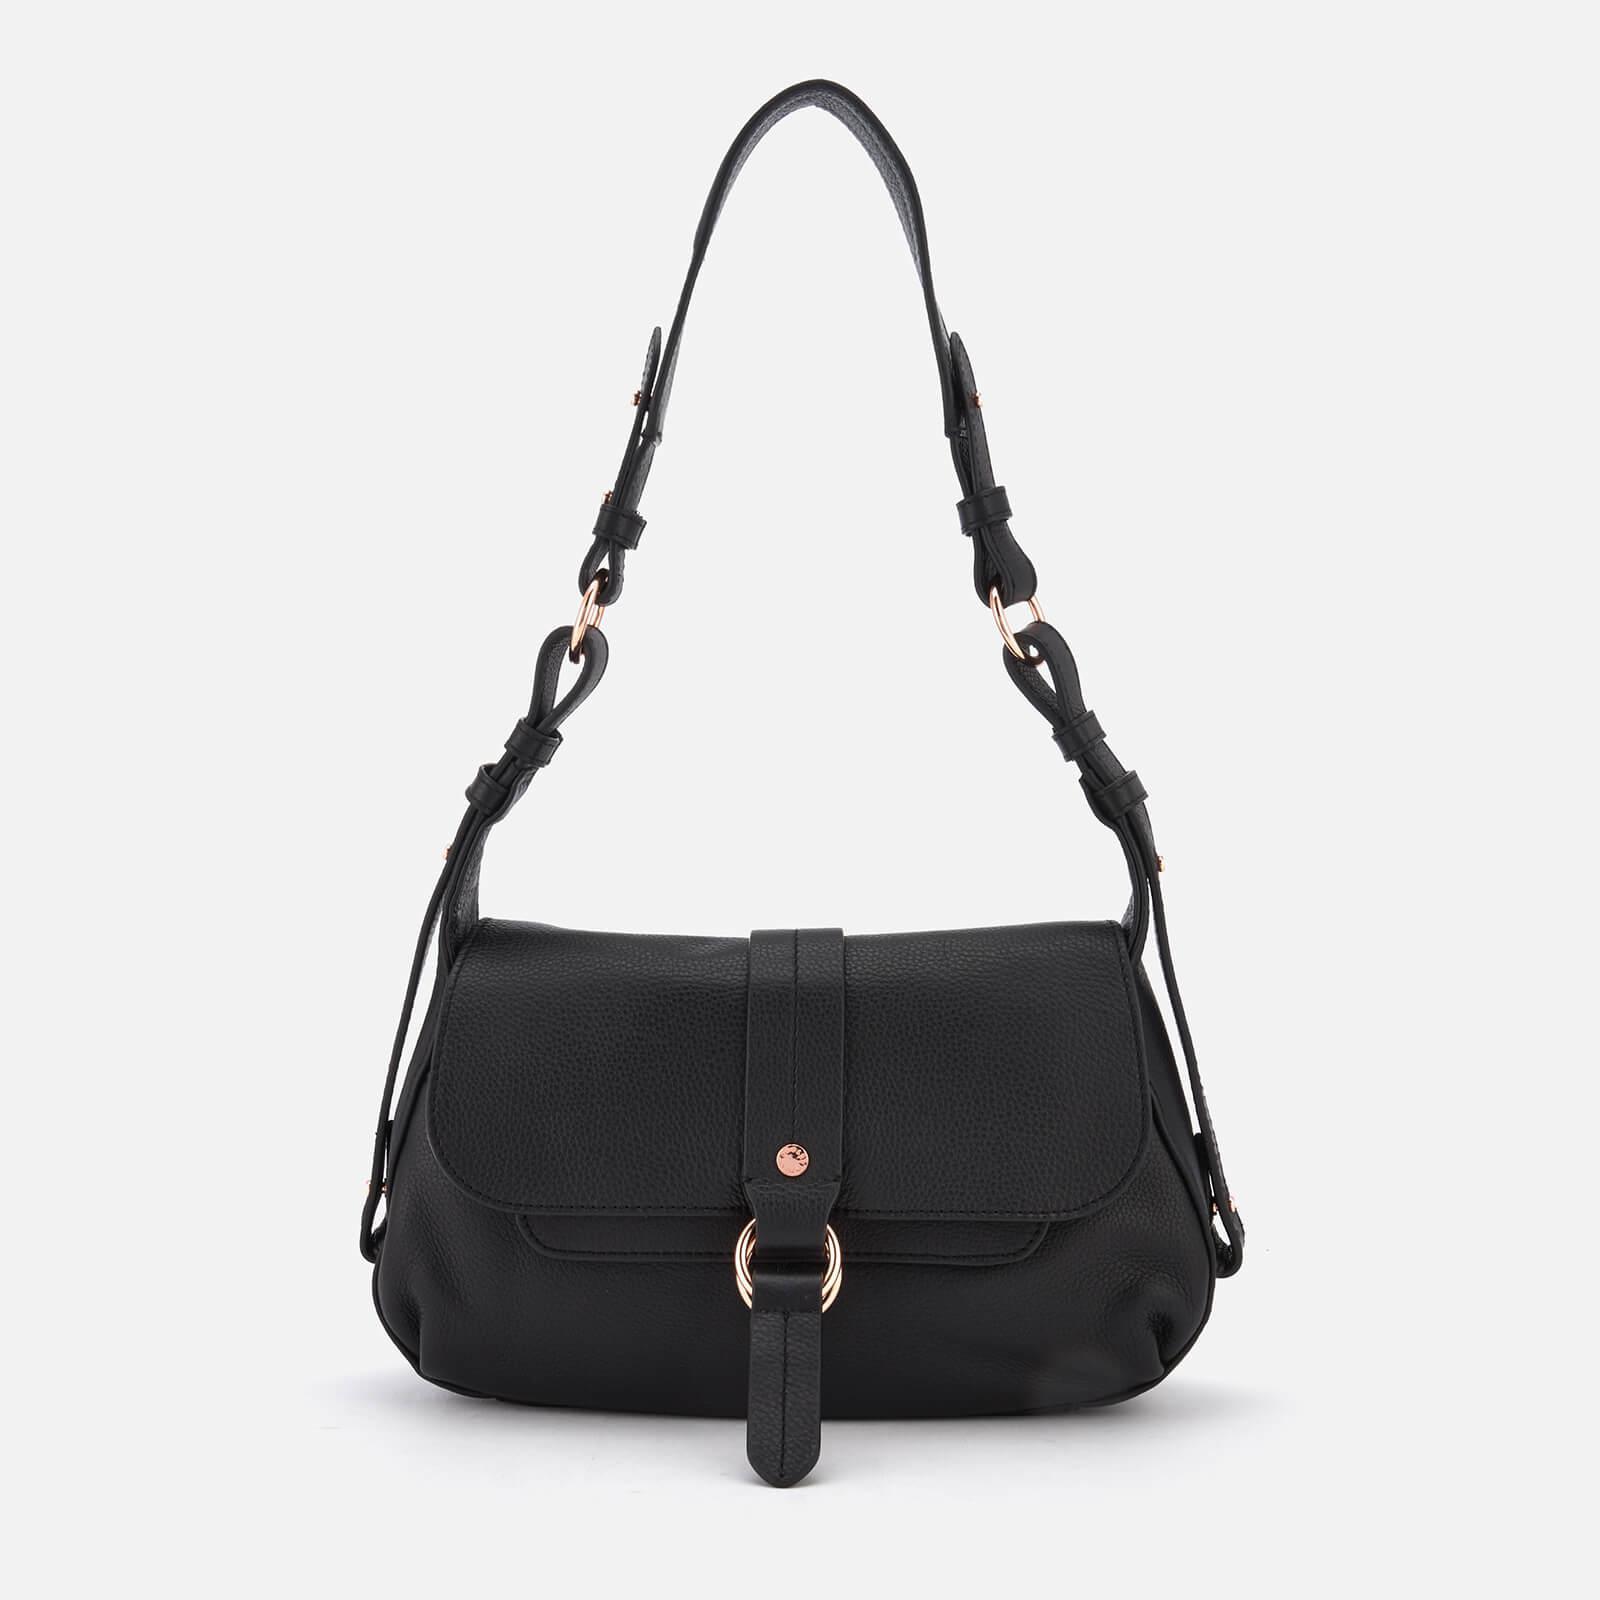 Radley Women S Black Trinity Square Medium Flapover Shoulder Bag